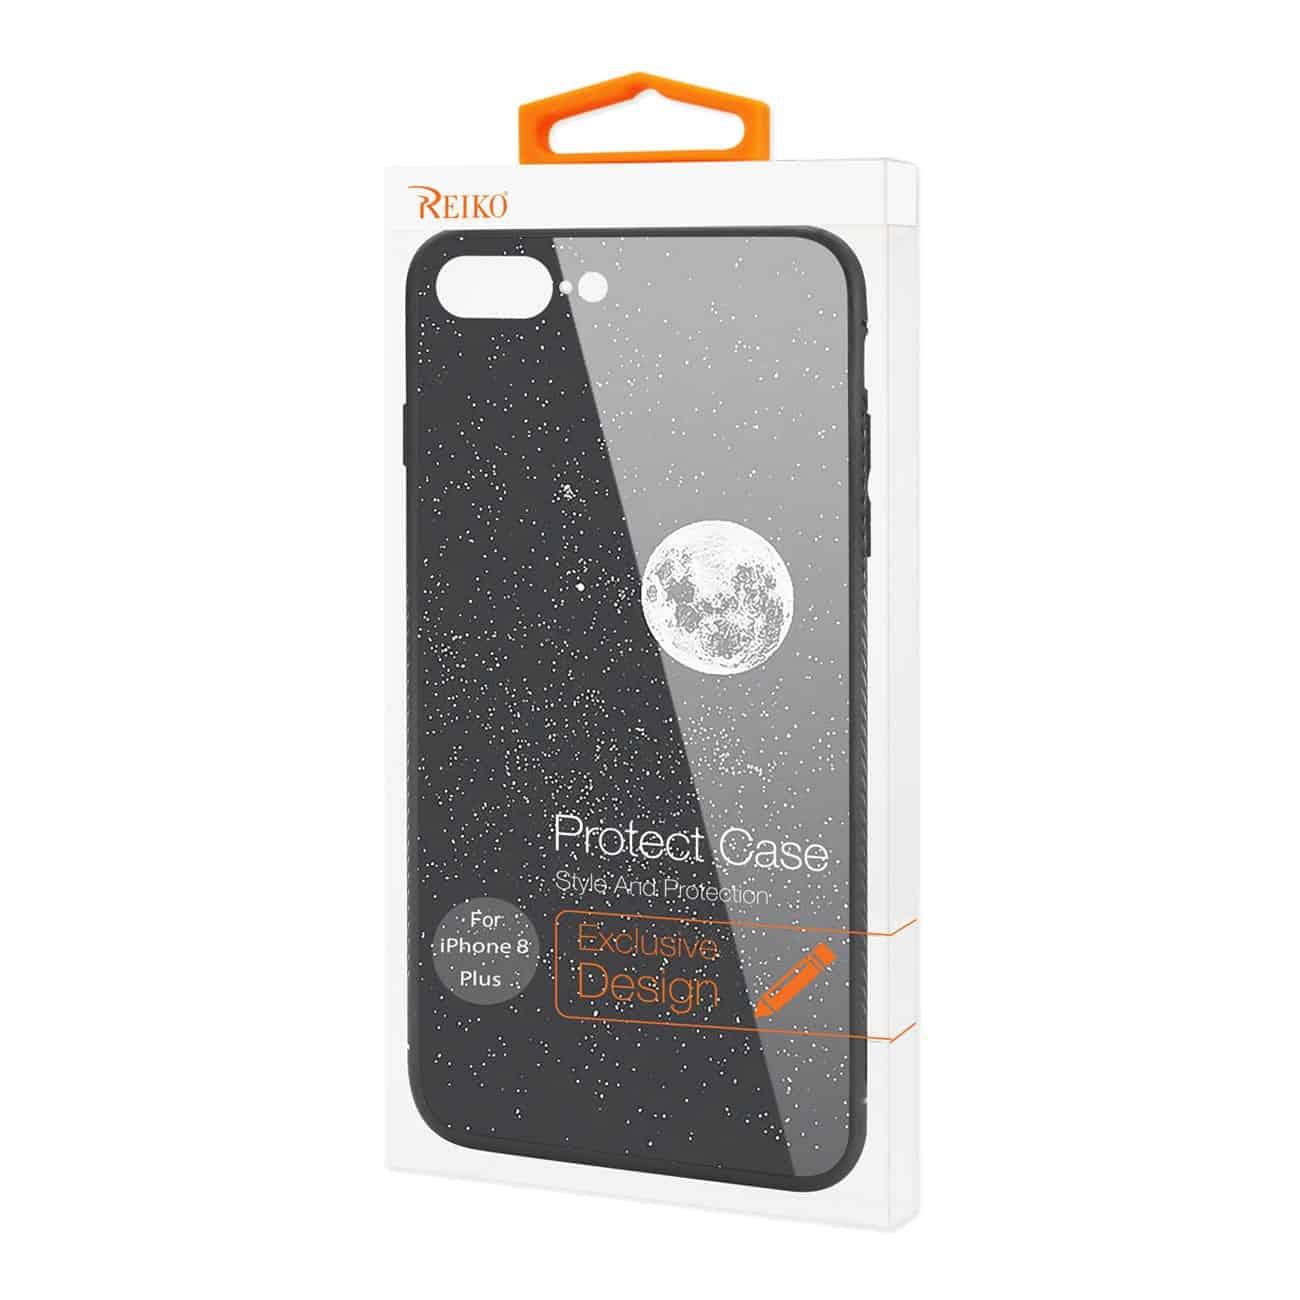 iPhone 8 Plus Hard Glass Design TPU Case With Universe Pattern